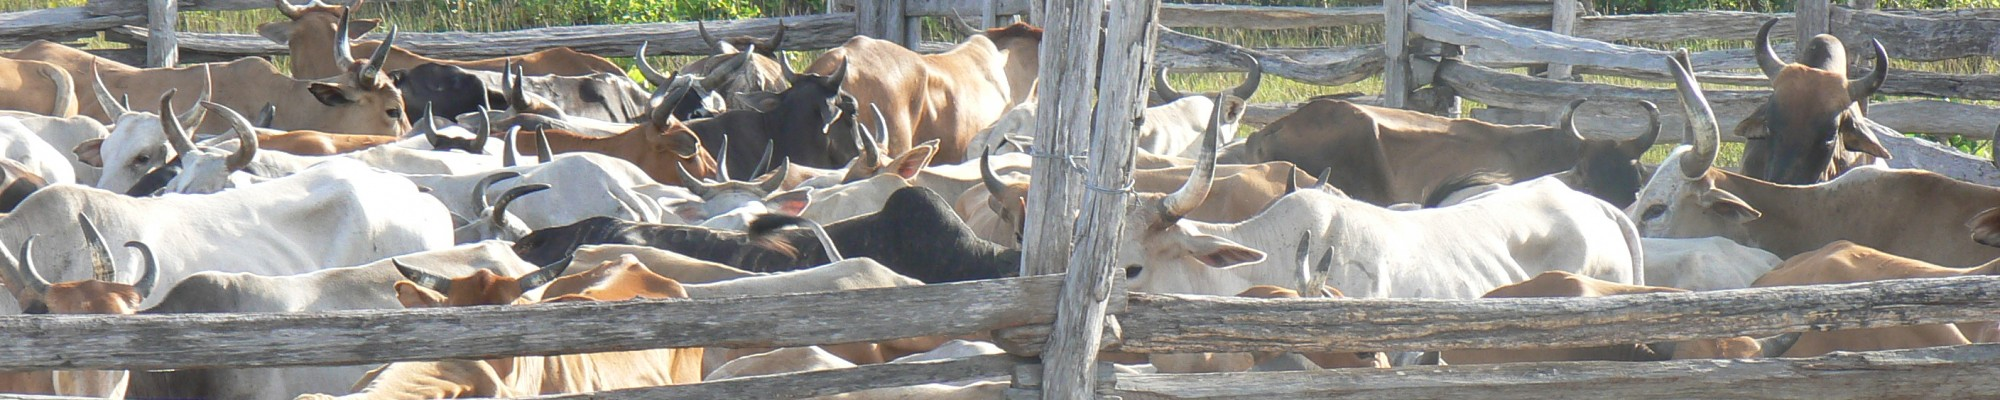 Guyana - Cattle